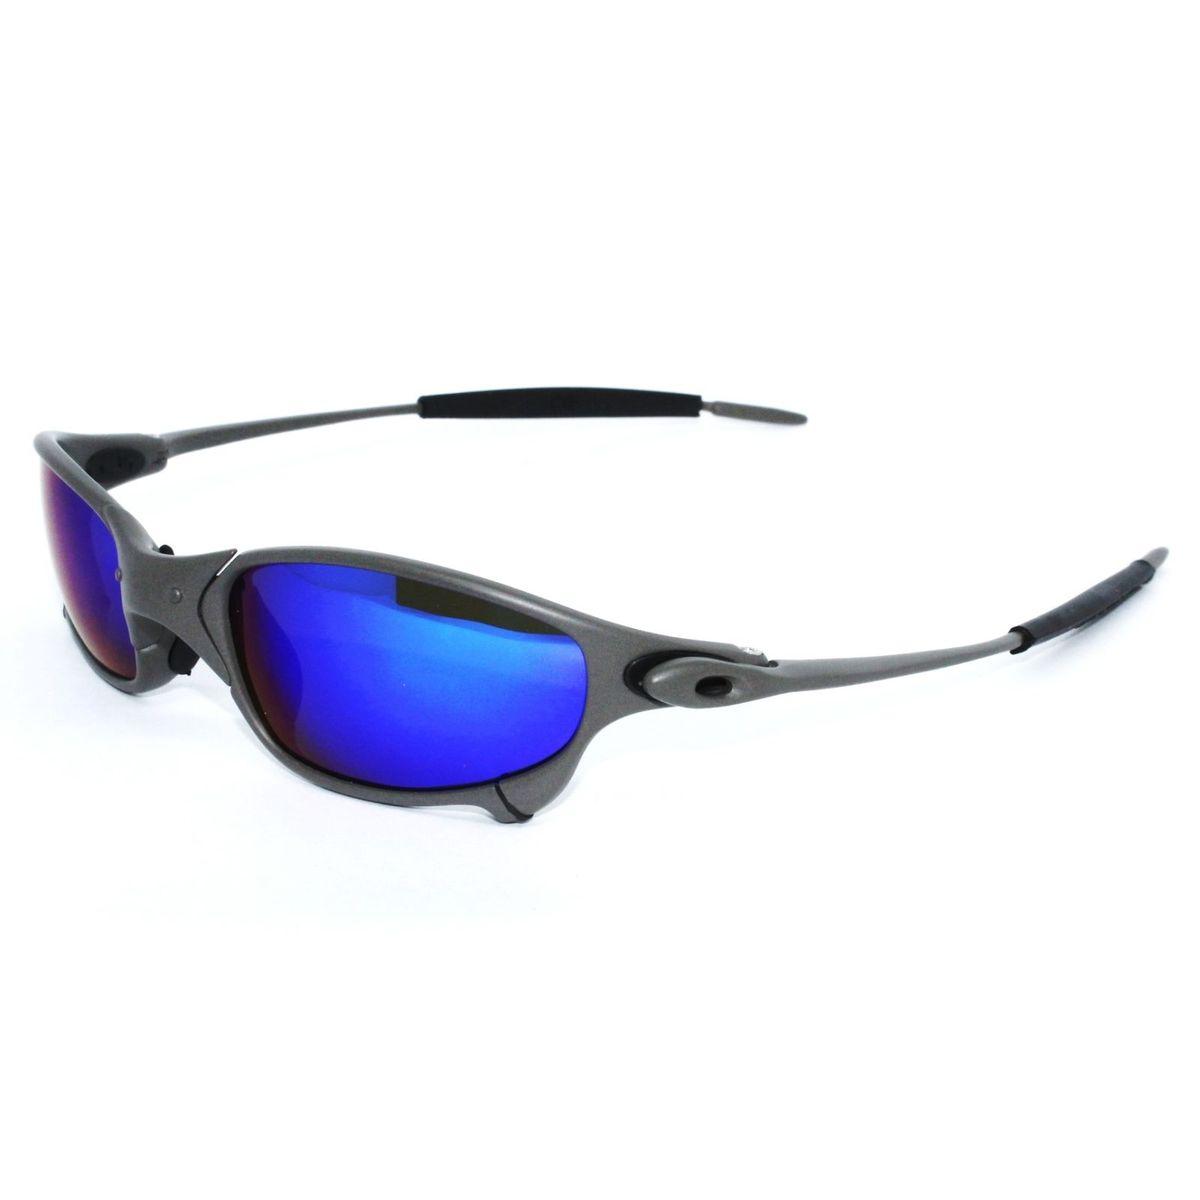 6185f334f4b9e Óculos Oakley Juliet 100% Polarizado Pronta Entrega!!!